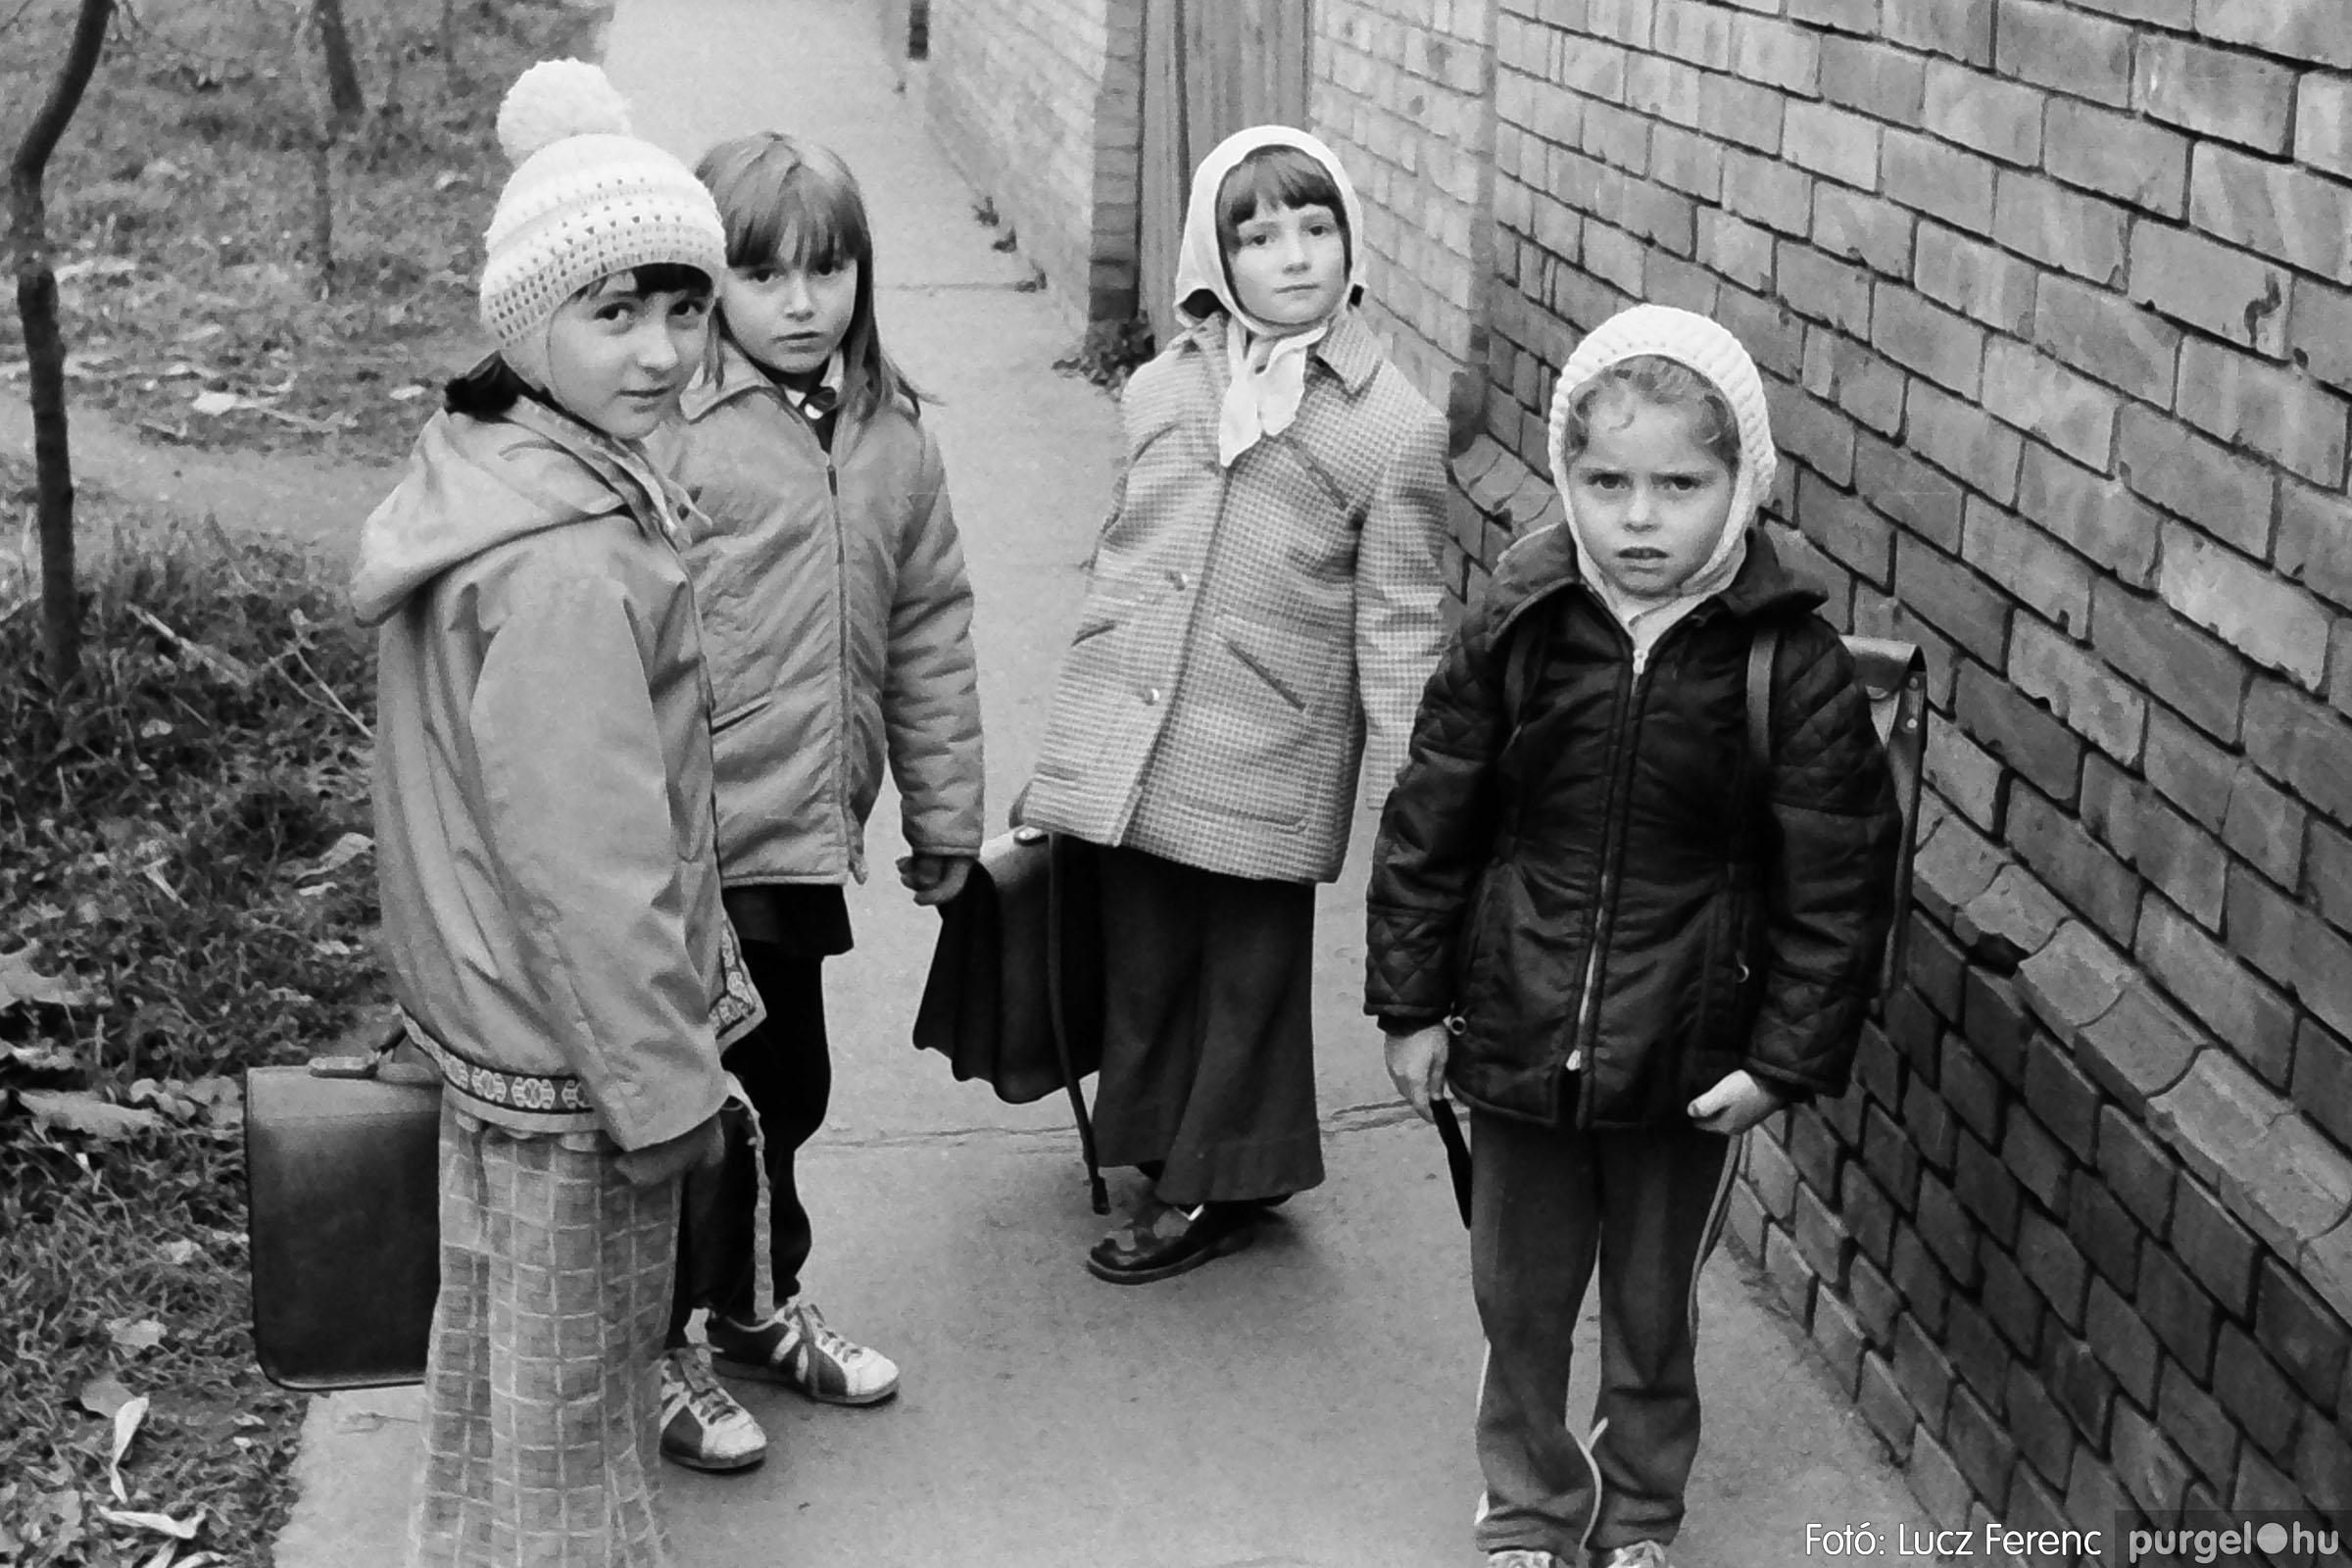 025 1975.10. Szovjet katonai emlékmű 009 - Fotó: Lucz Ferenc IMG00238q.jpg